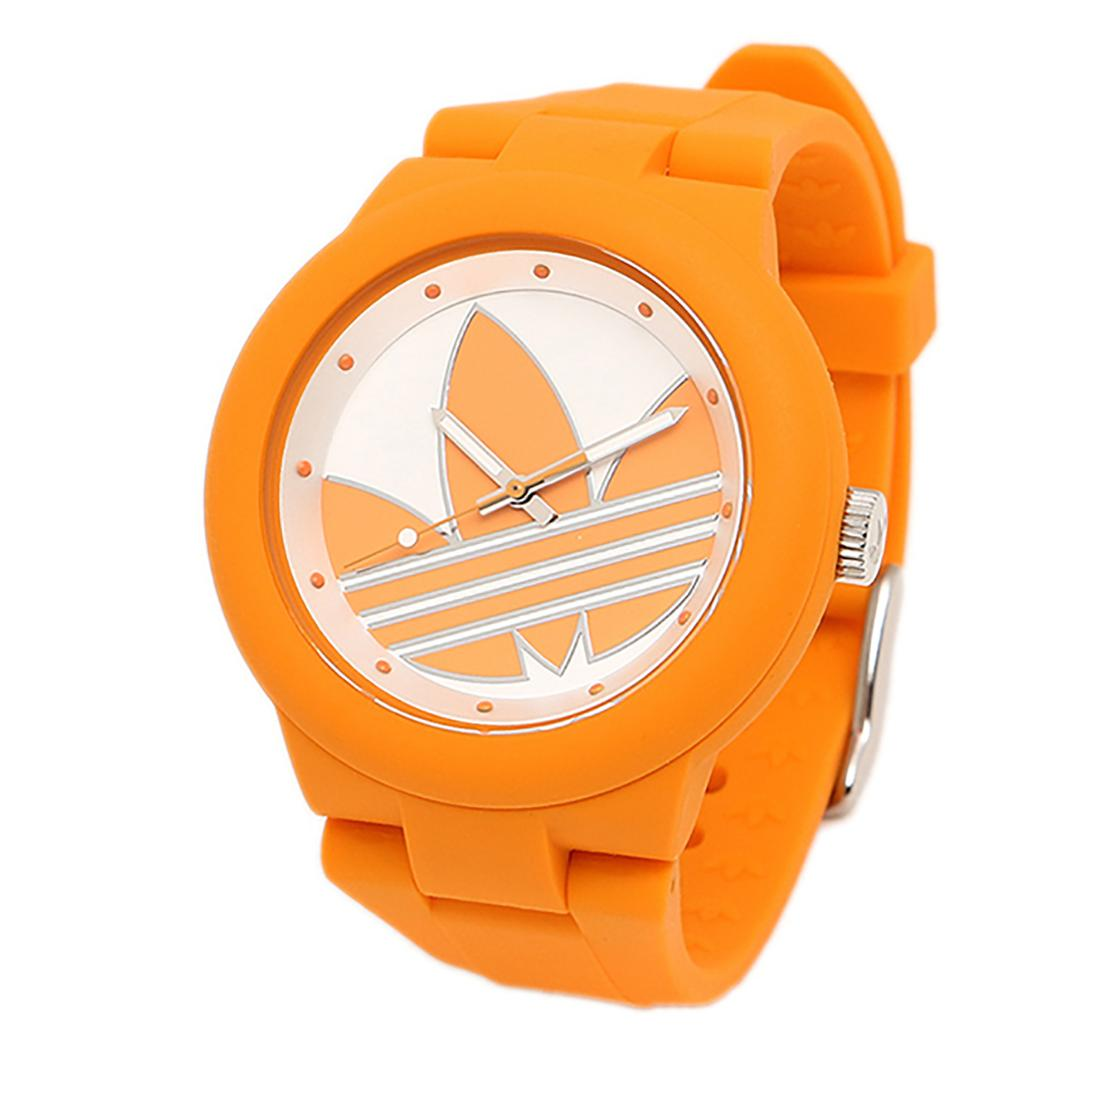 Đồng hồ Nữ Dây Silicone ADIDAS ADH3116